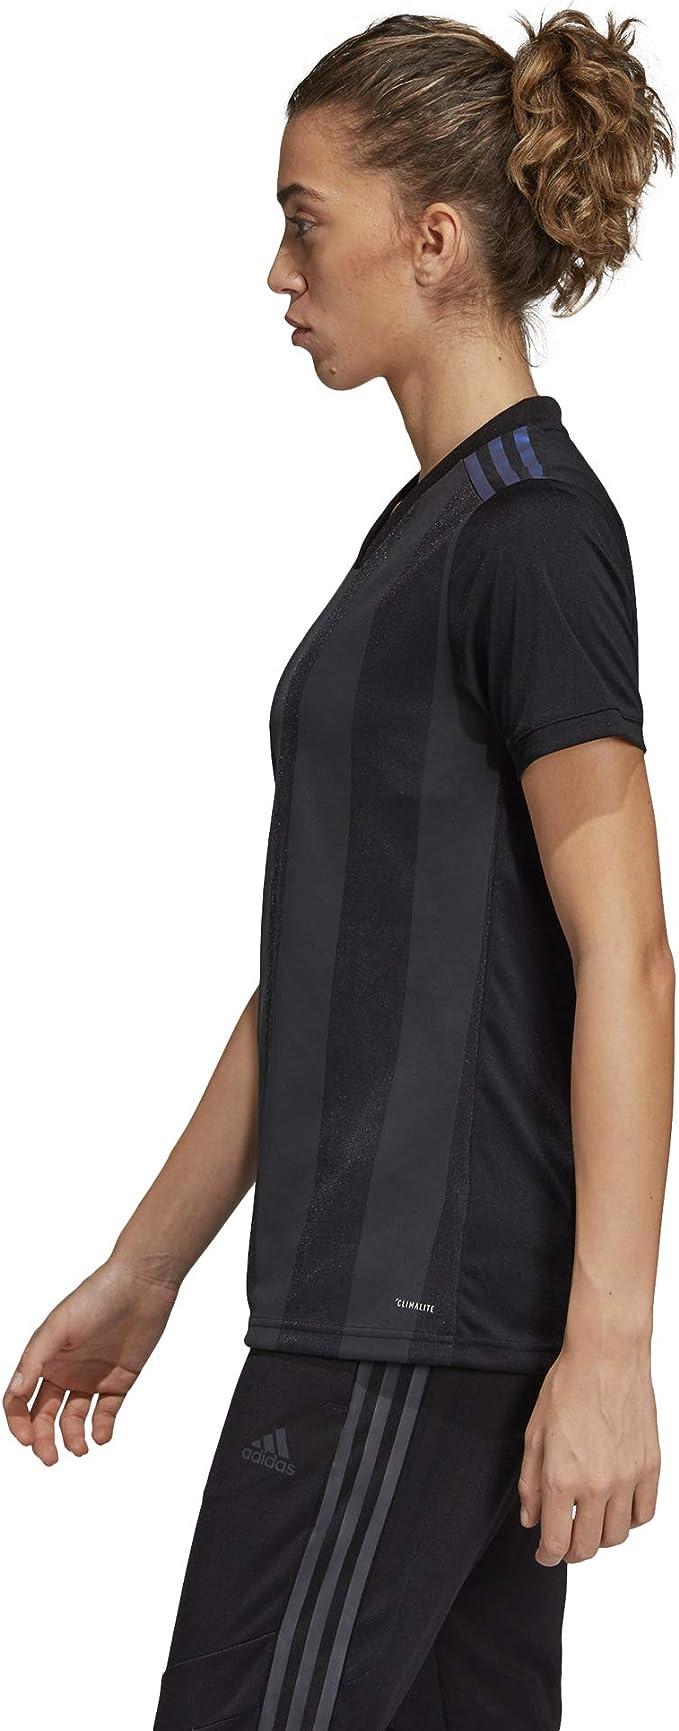 Amazon.com : adidas Women's Alphaskin Tiro Jersey : Sports & Outdoors